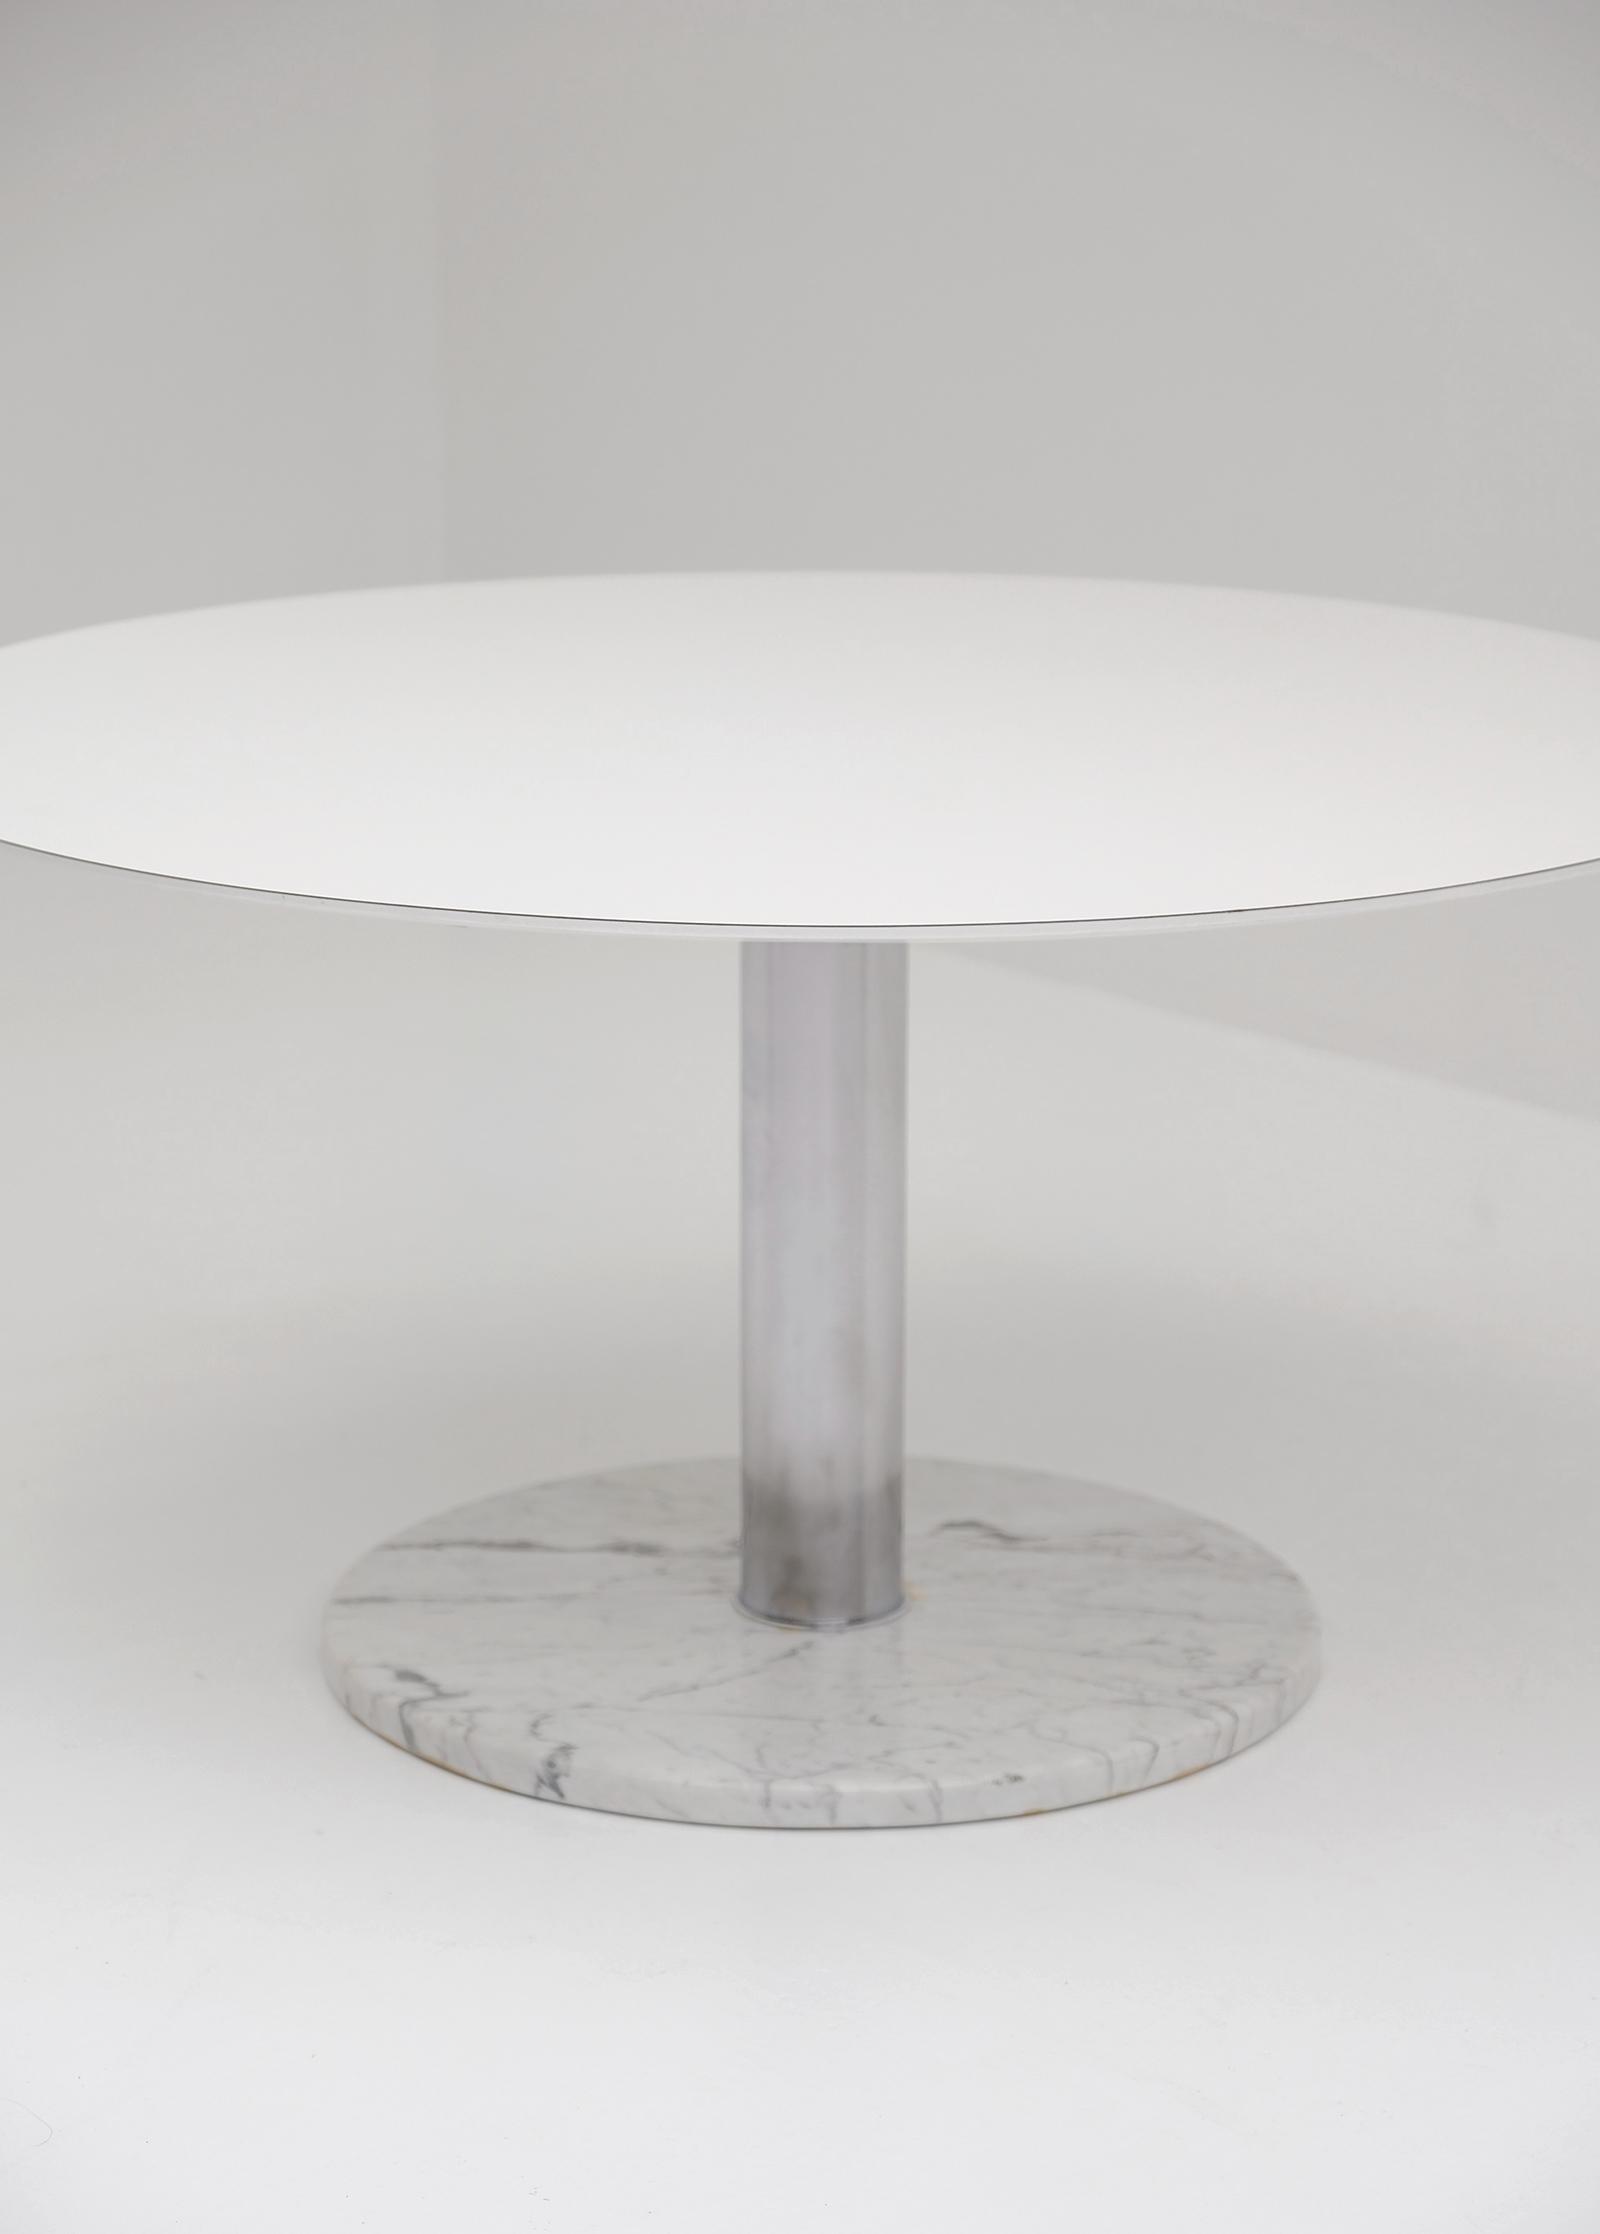 Alfred Hendrickx Round Dining Tableimage 5